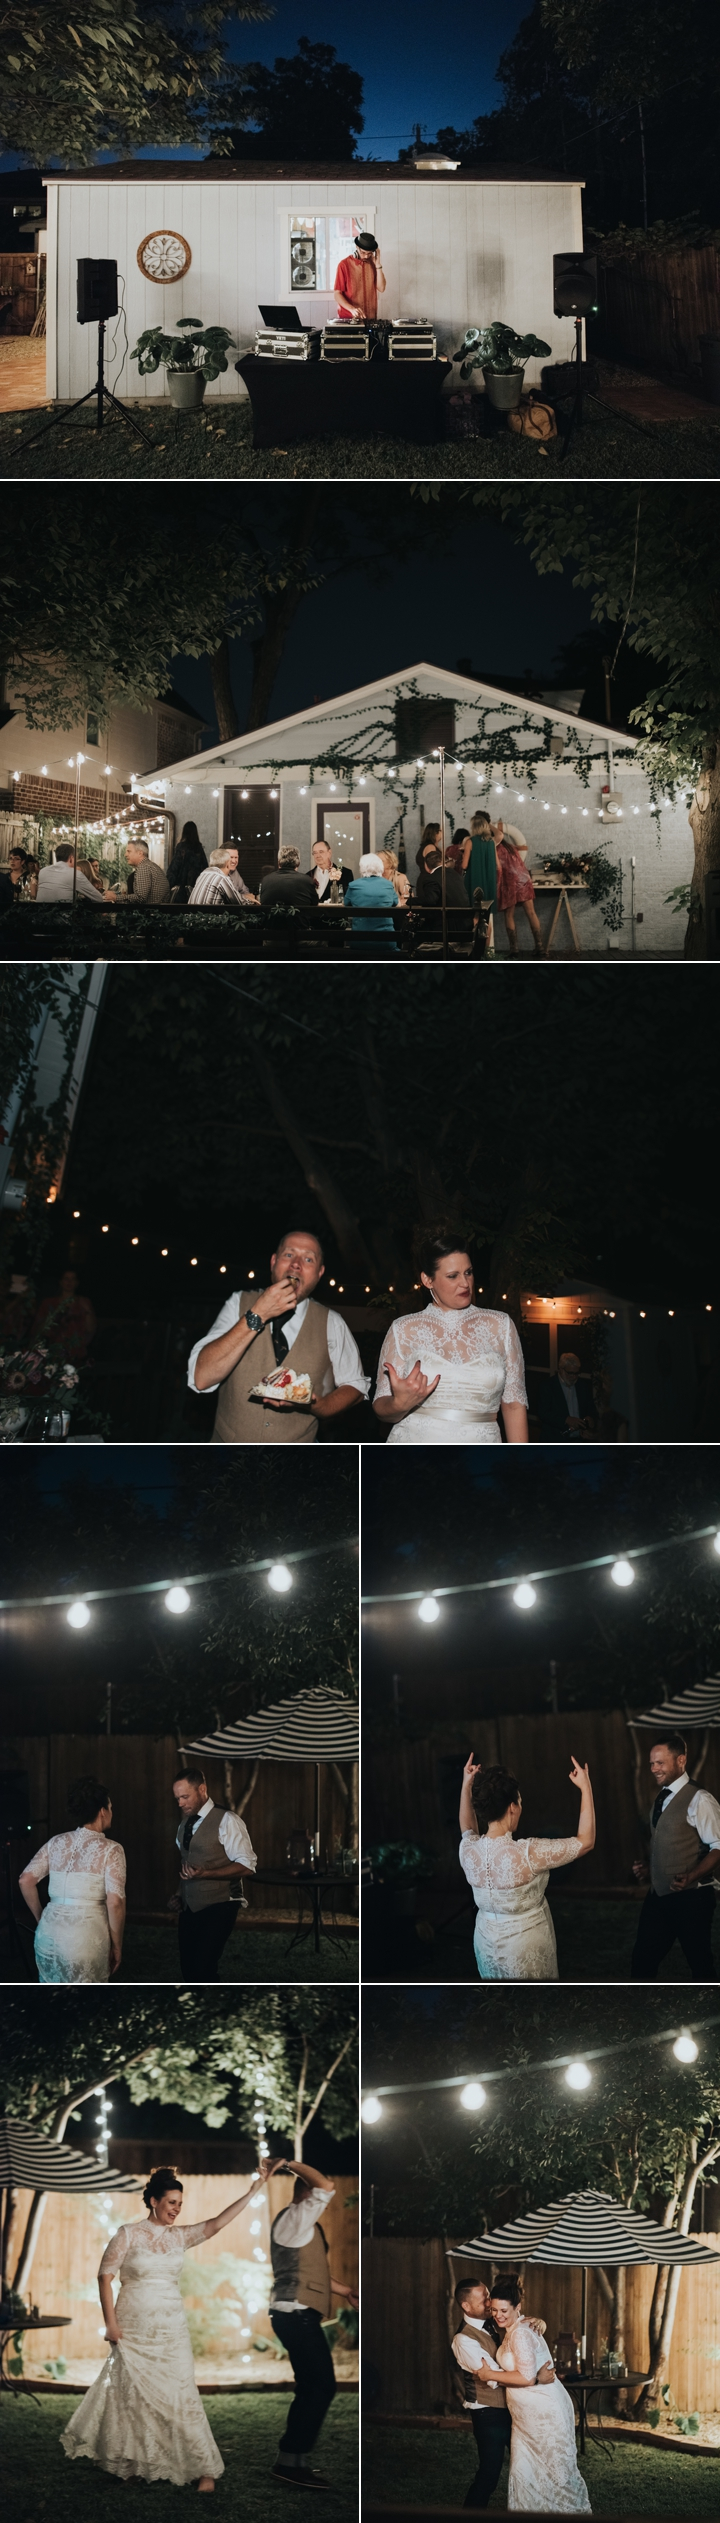 dallas-wedding-photographers-jp 27.jpg